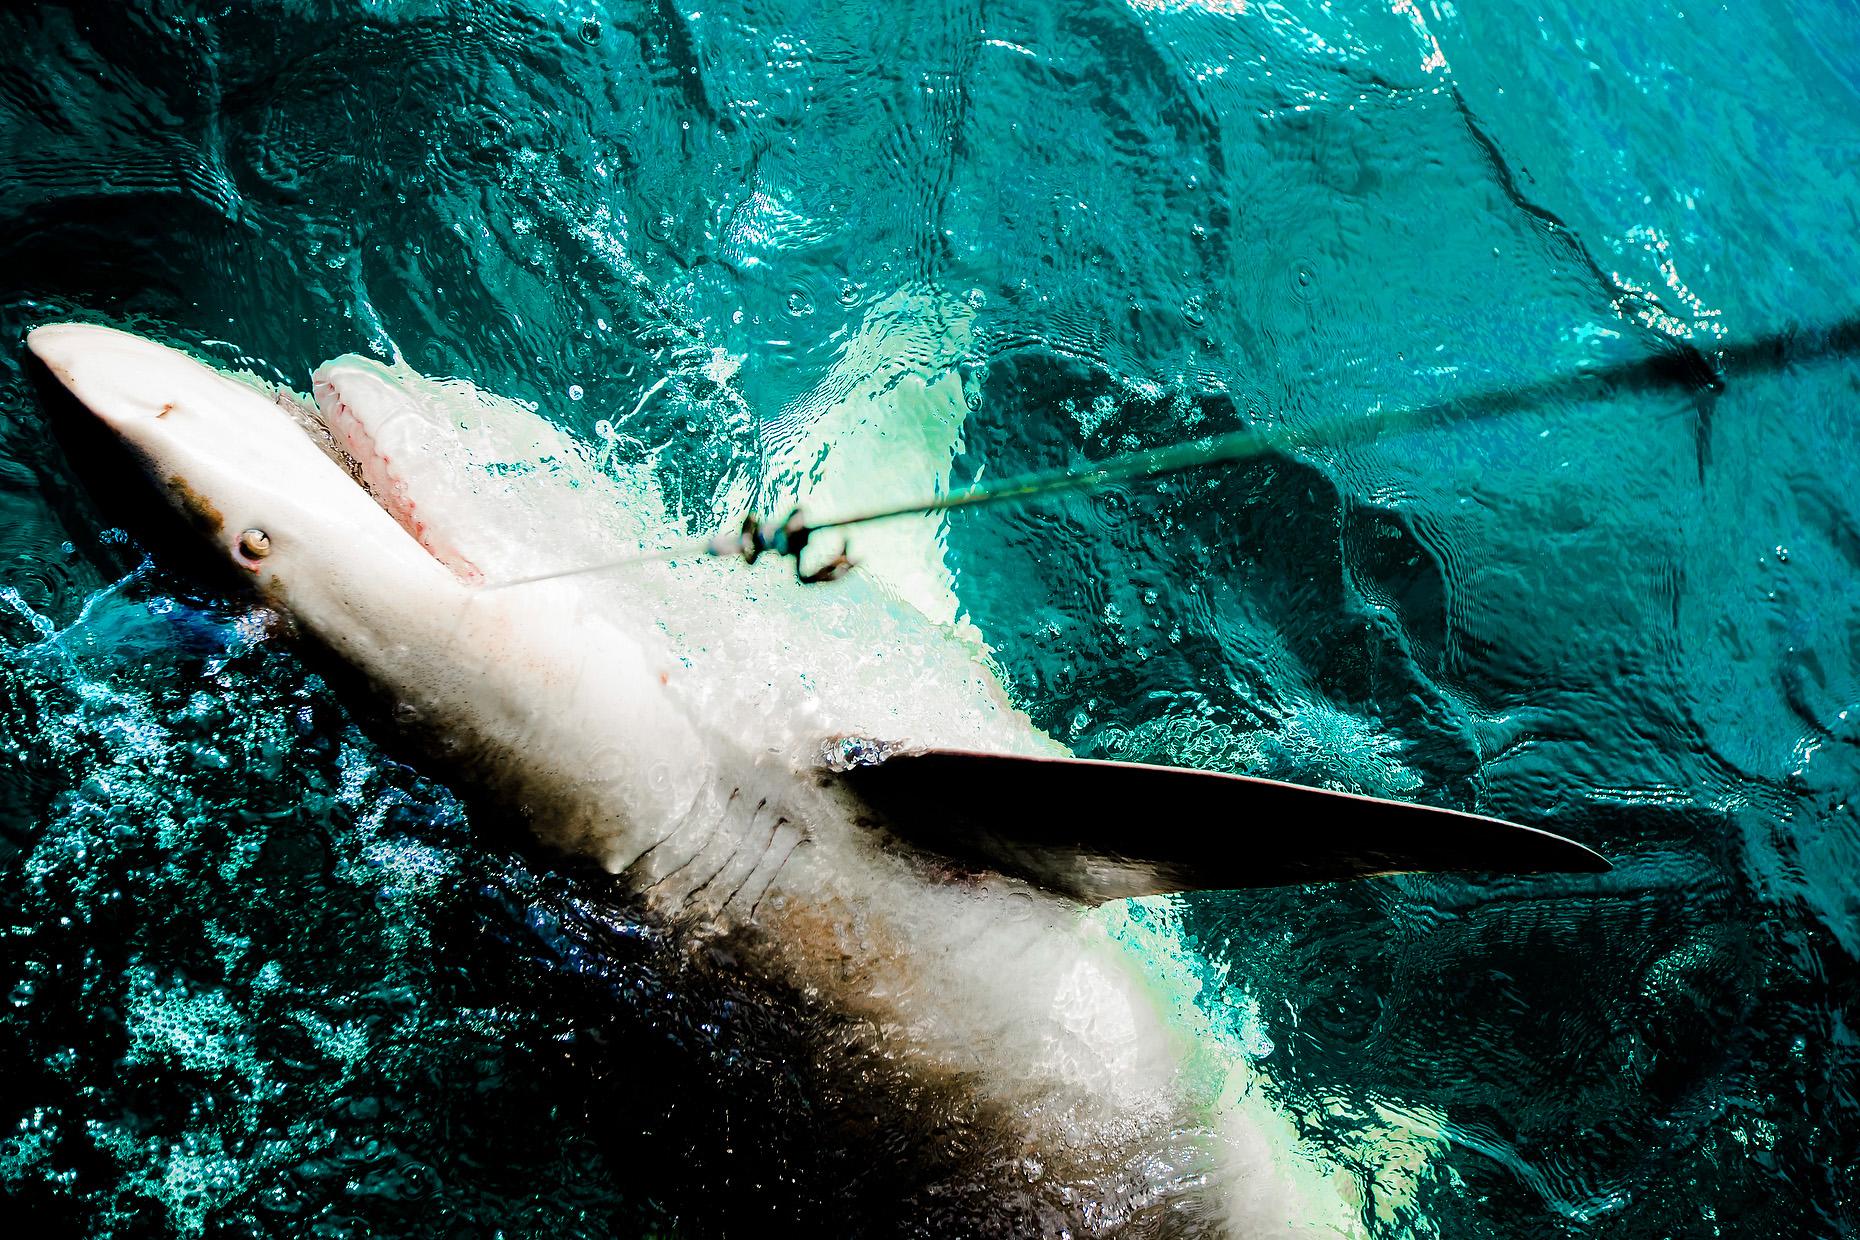 NEW COLLEGE OF FLORIDA SHARK MARINE BIOLOGY 0006.JPG